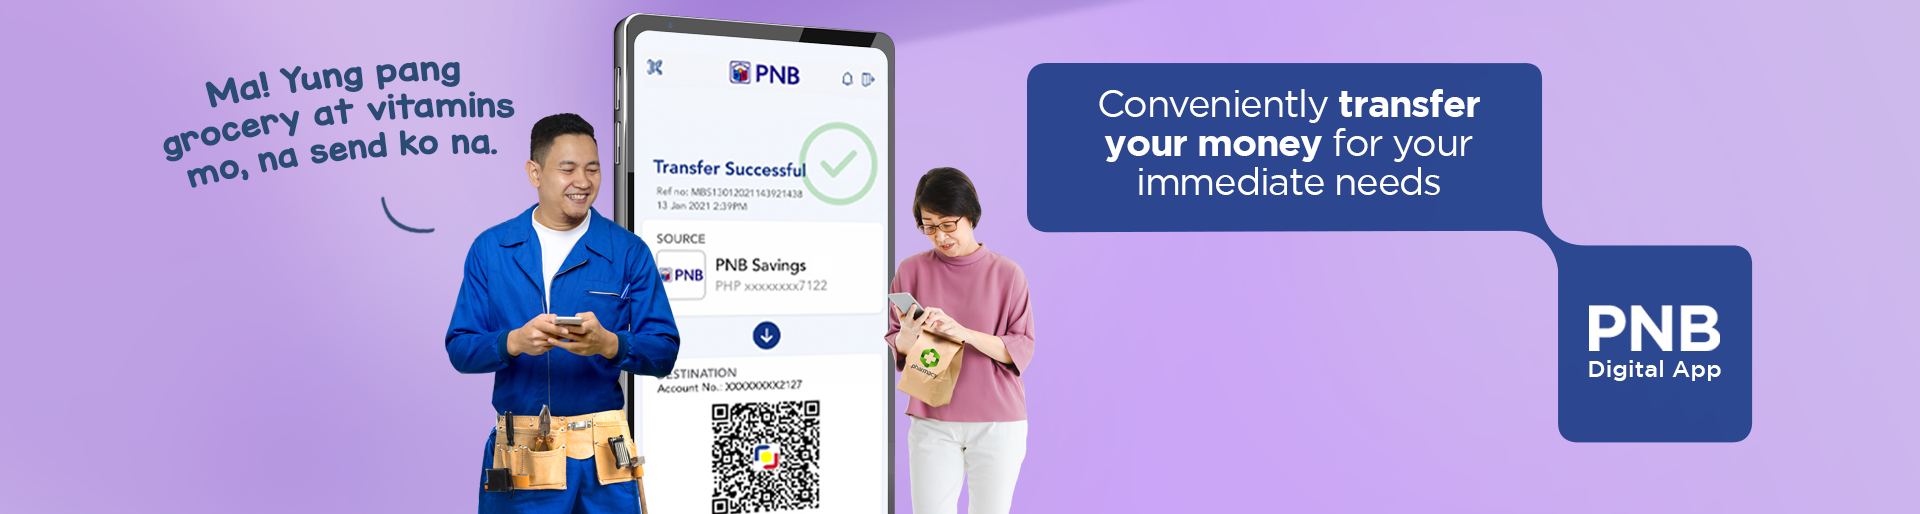 PNB Digital banking Send Money